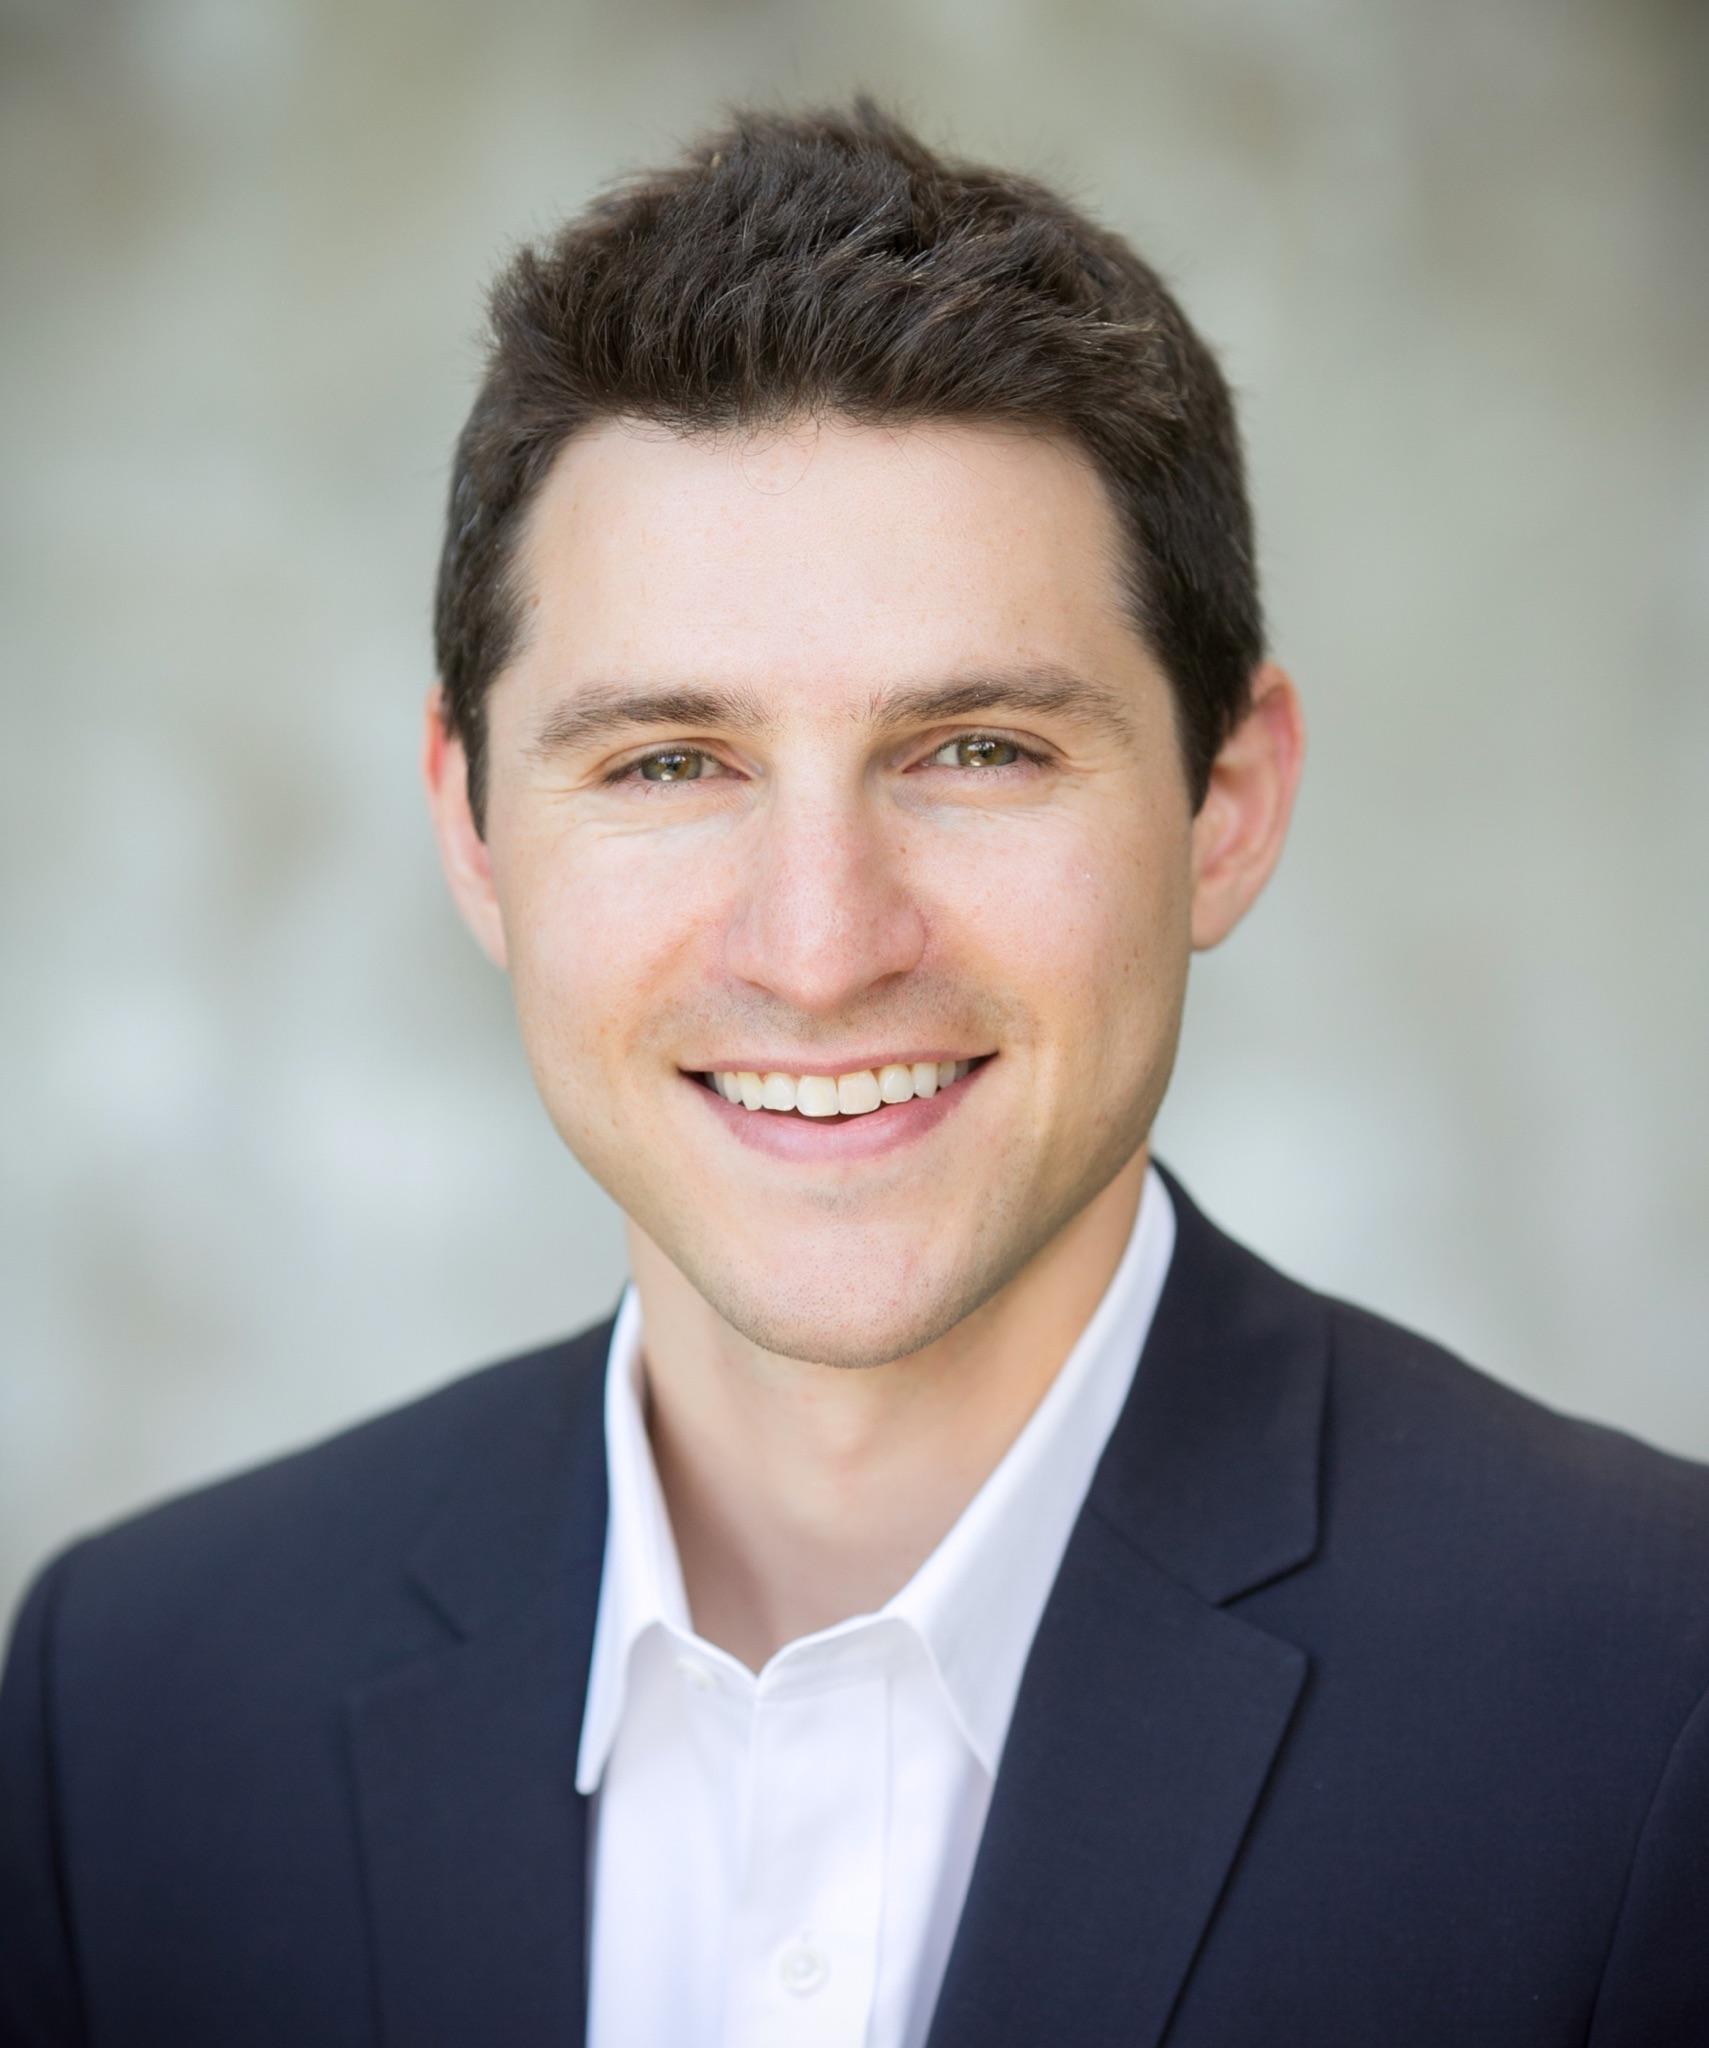 Gideon-Cohn-Good-Capital-financial-advisor